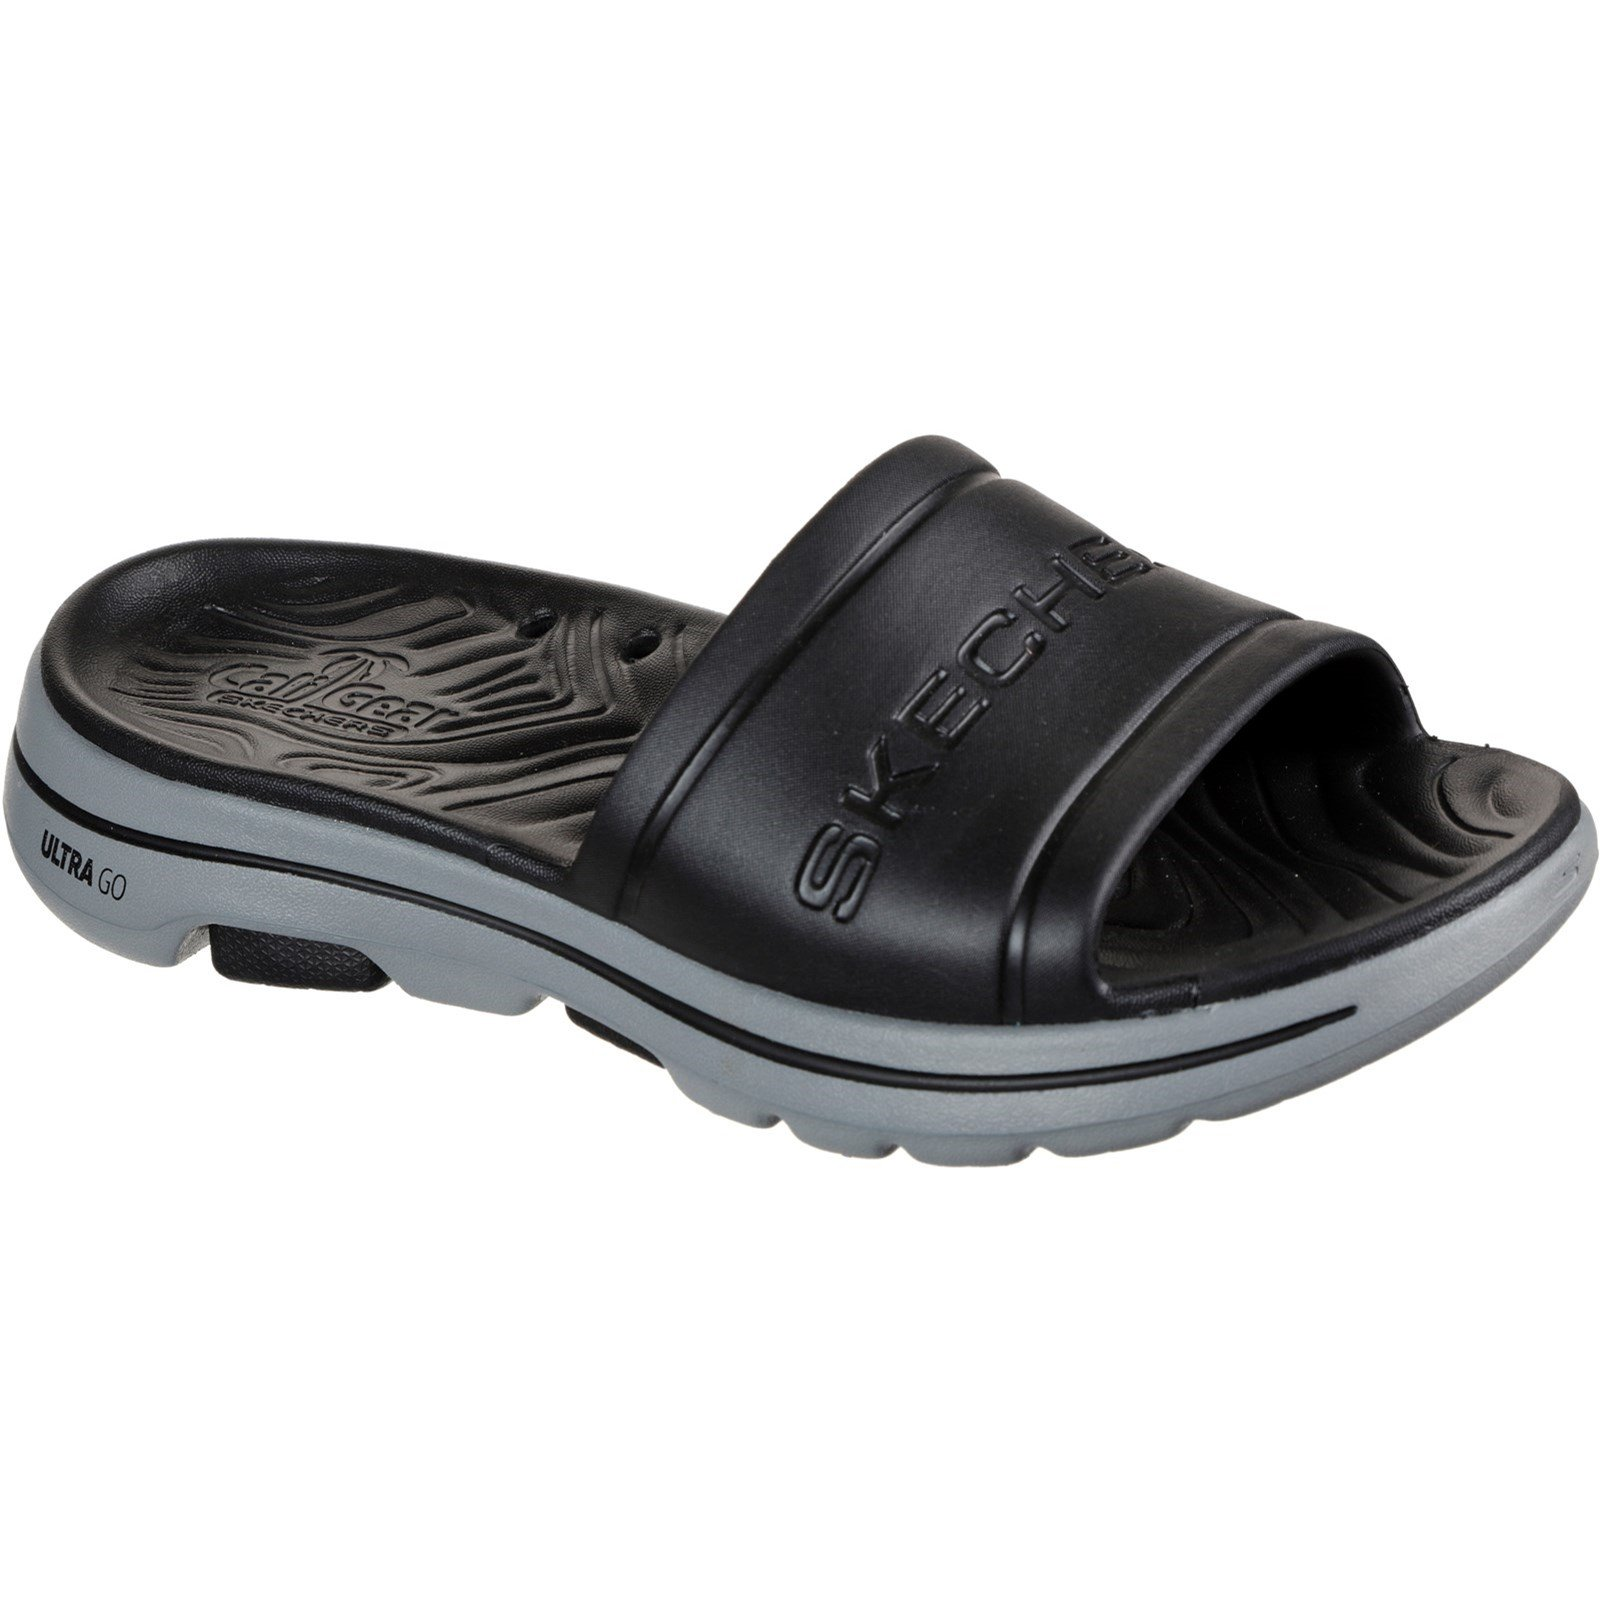 Skechers Men's Go Walk 5 Surfs Out Summer Sandal Various Colours 32207 - Black/Grey 9